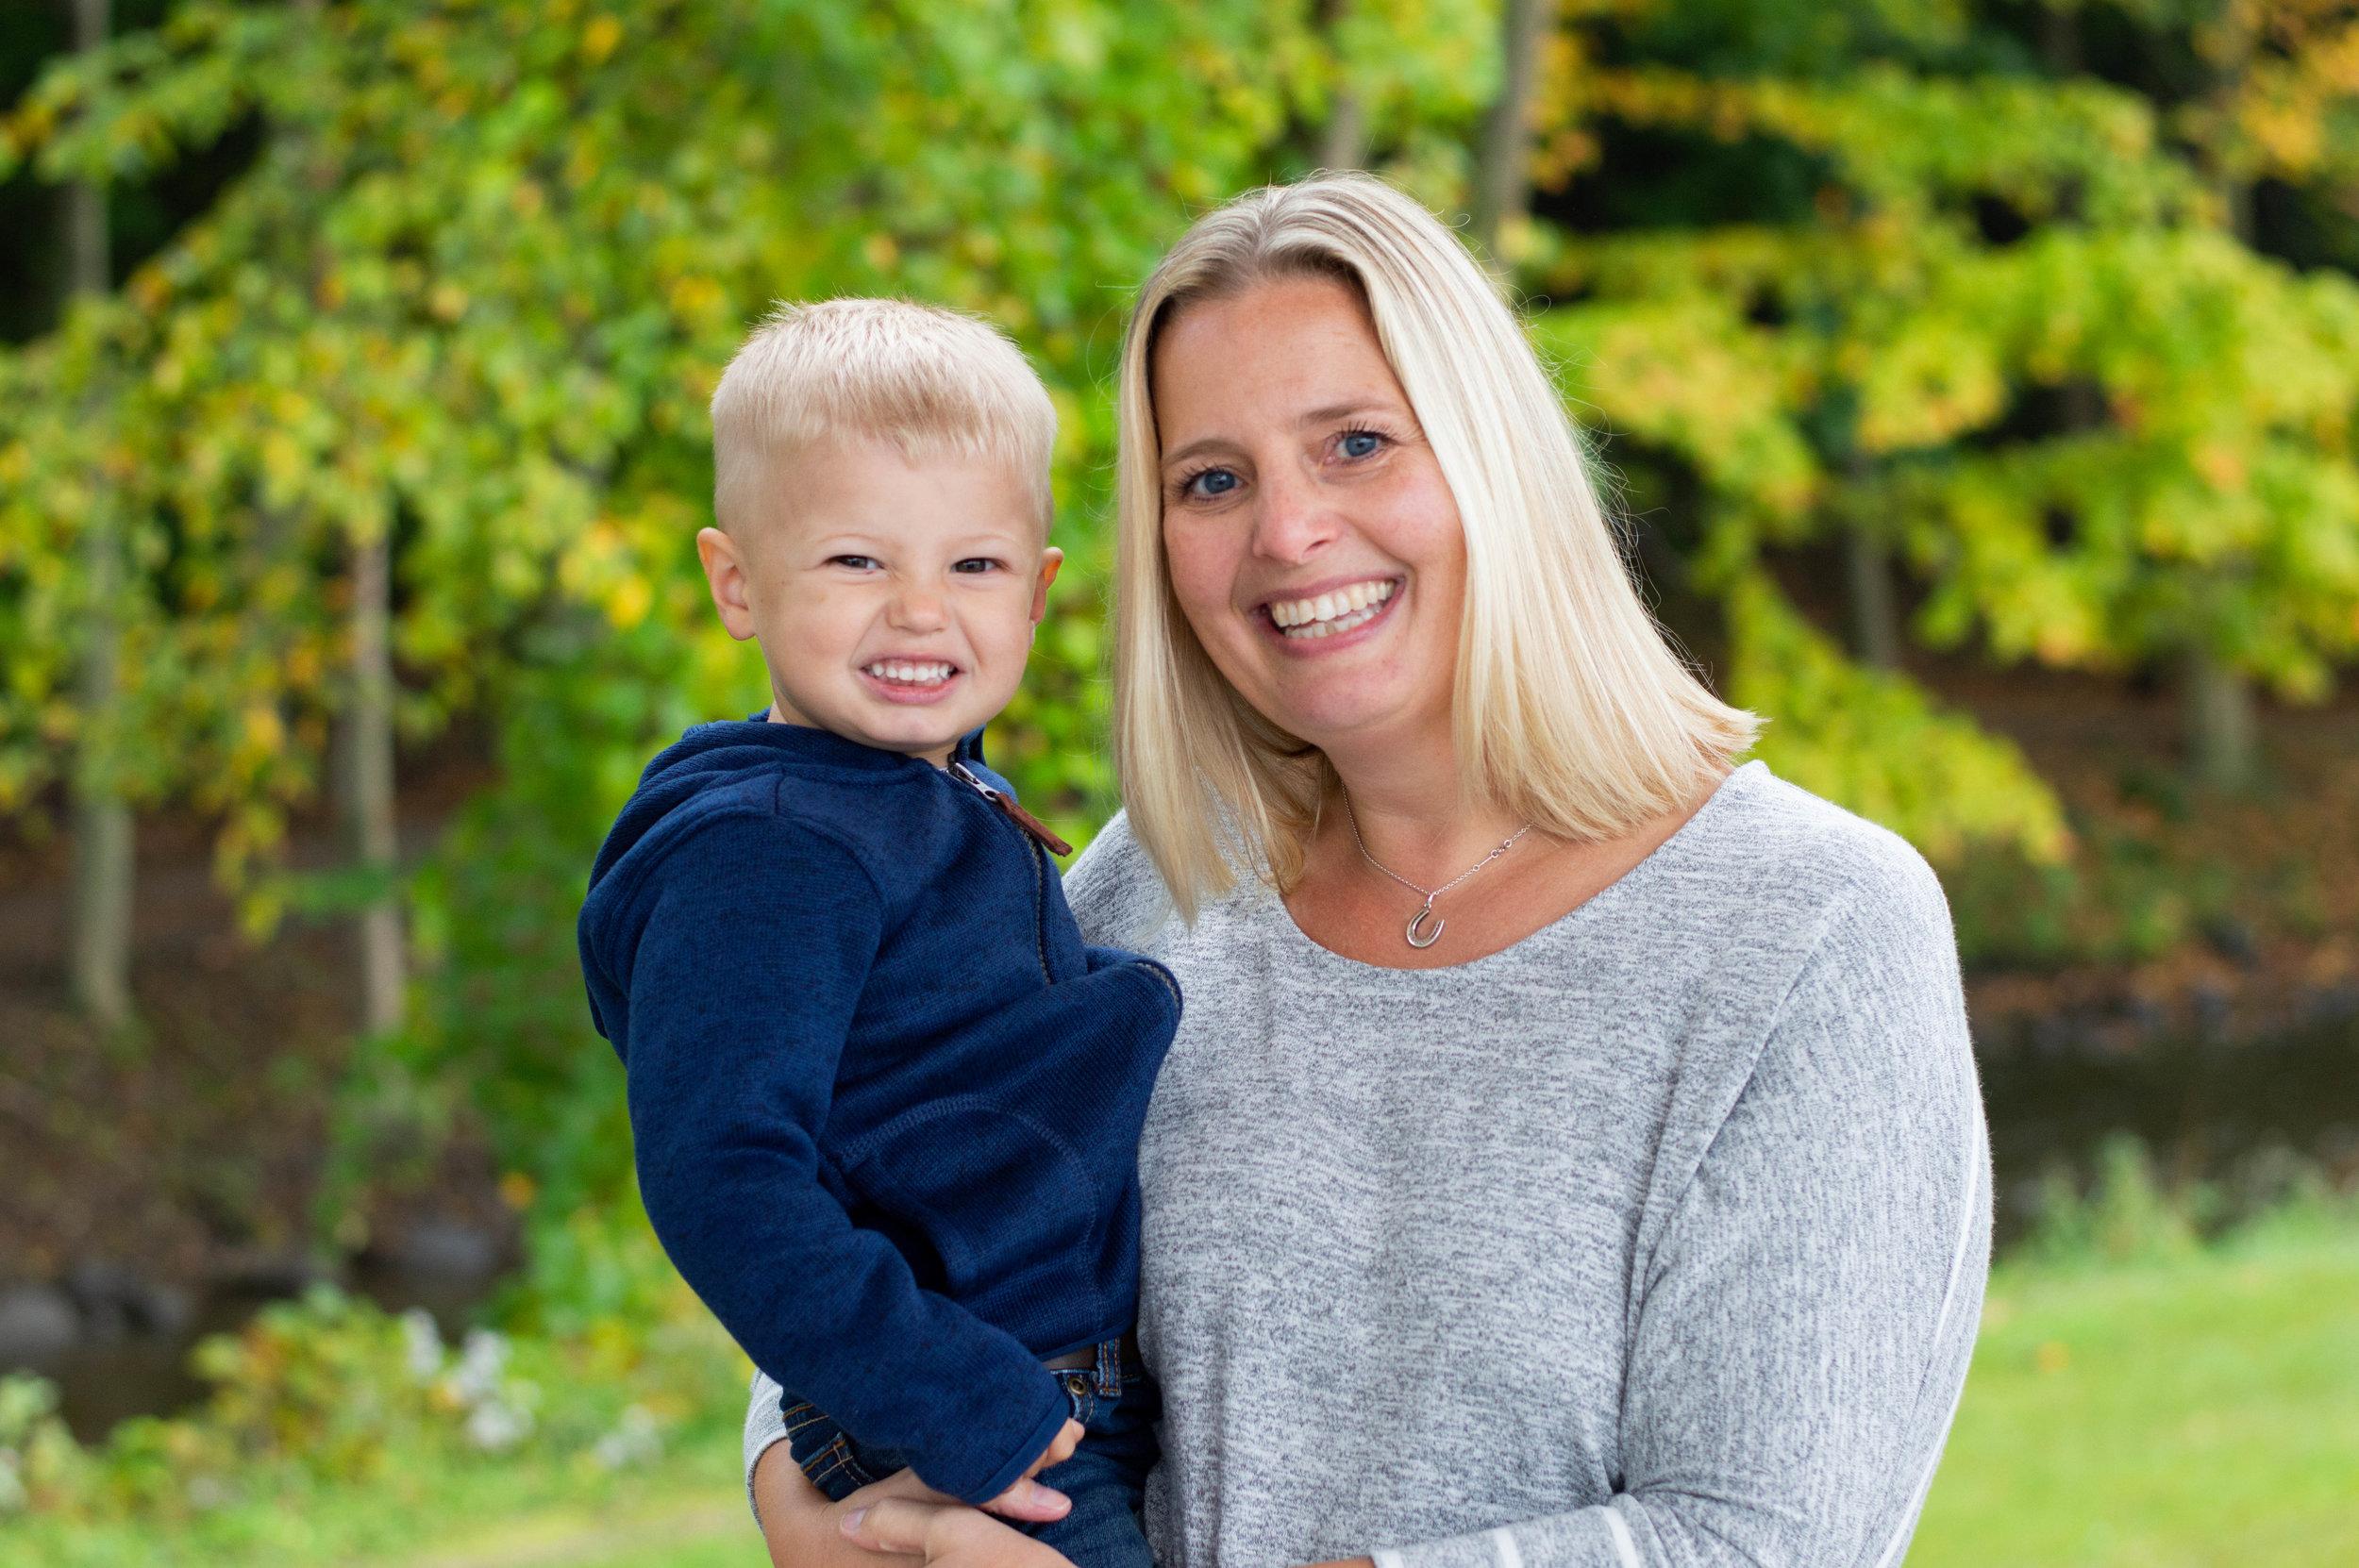 Vanessa Jordan Families, Plymouth Wisconsin, Fall Family Session